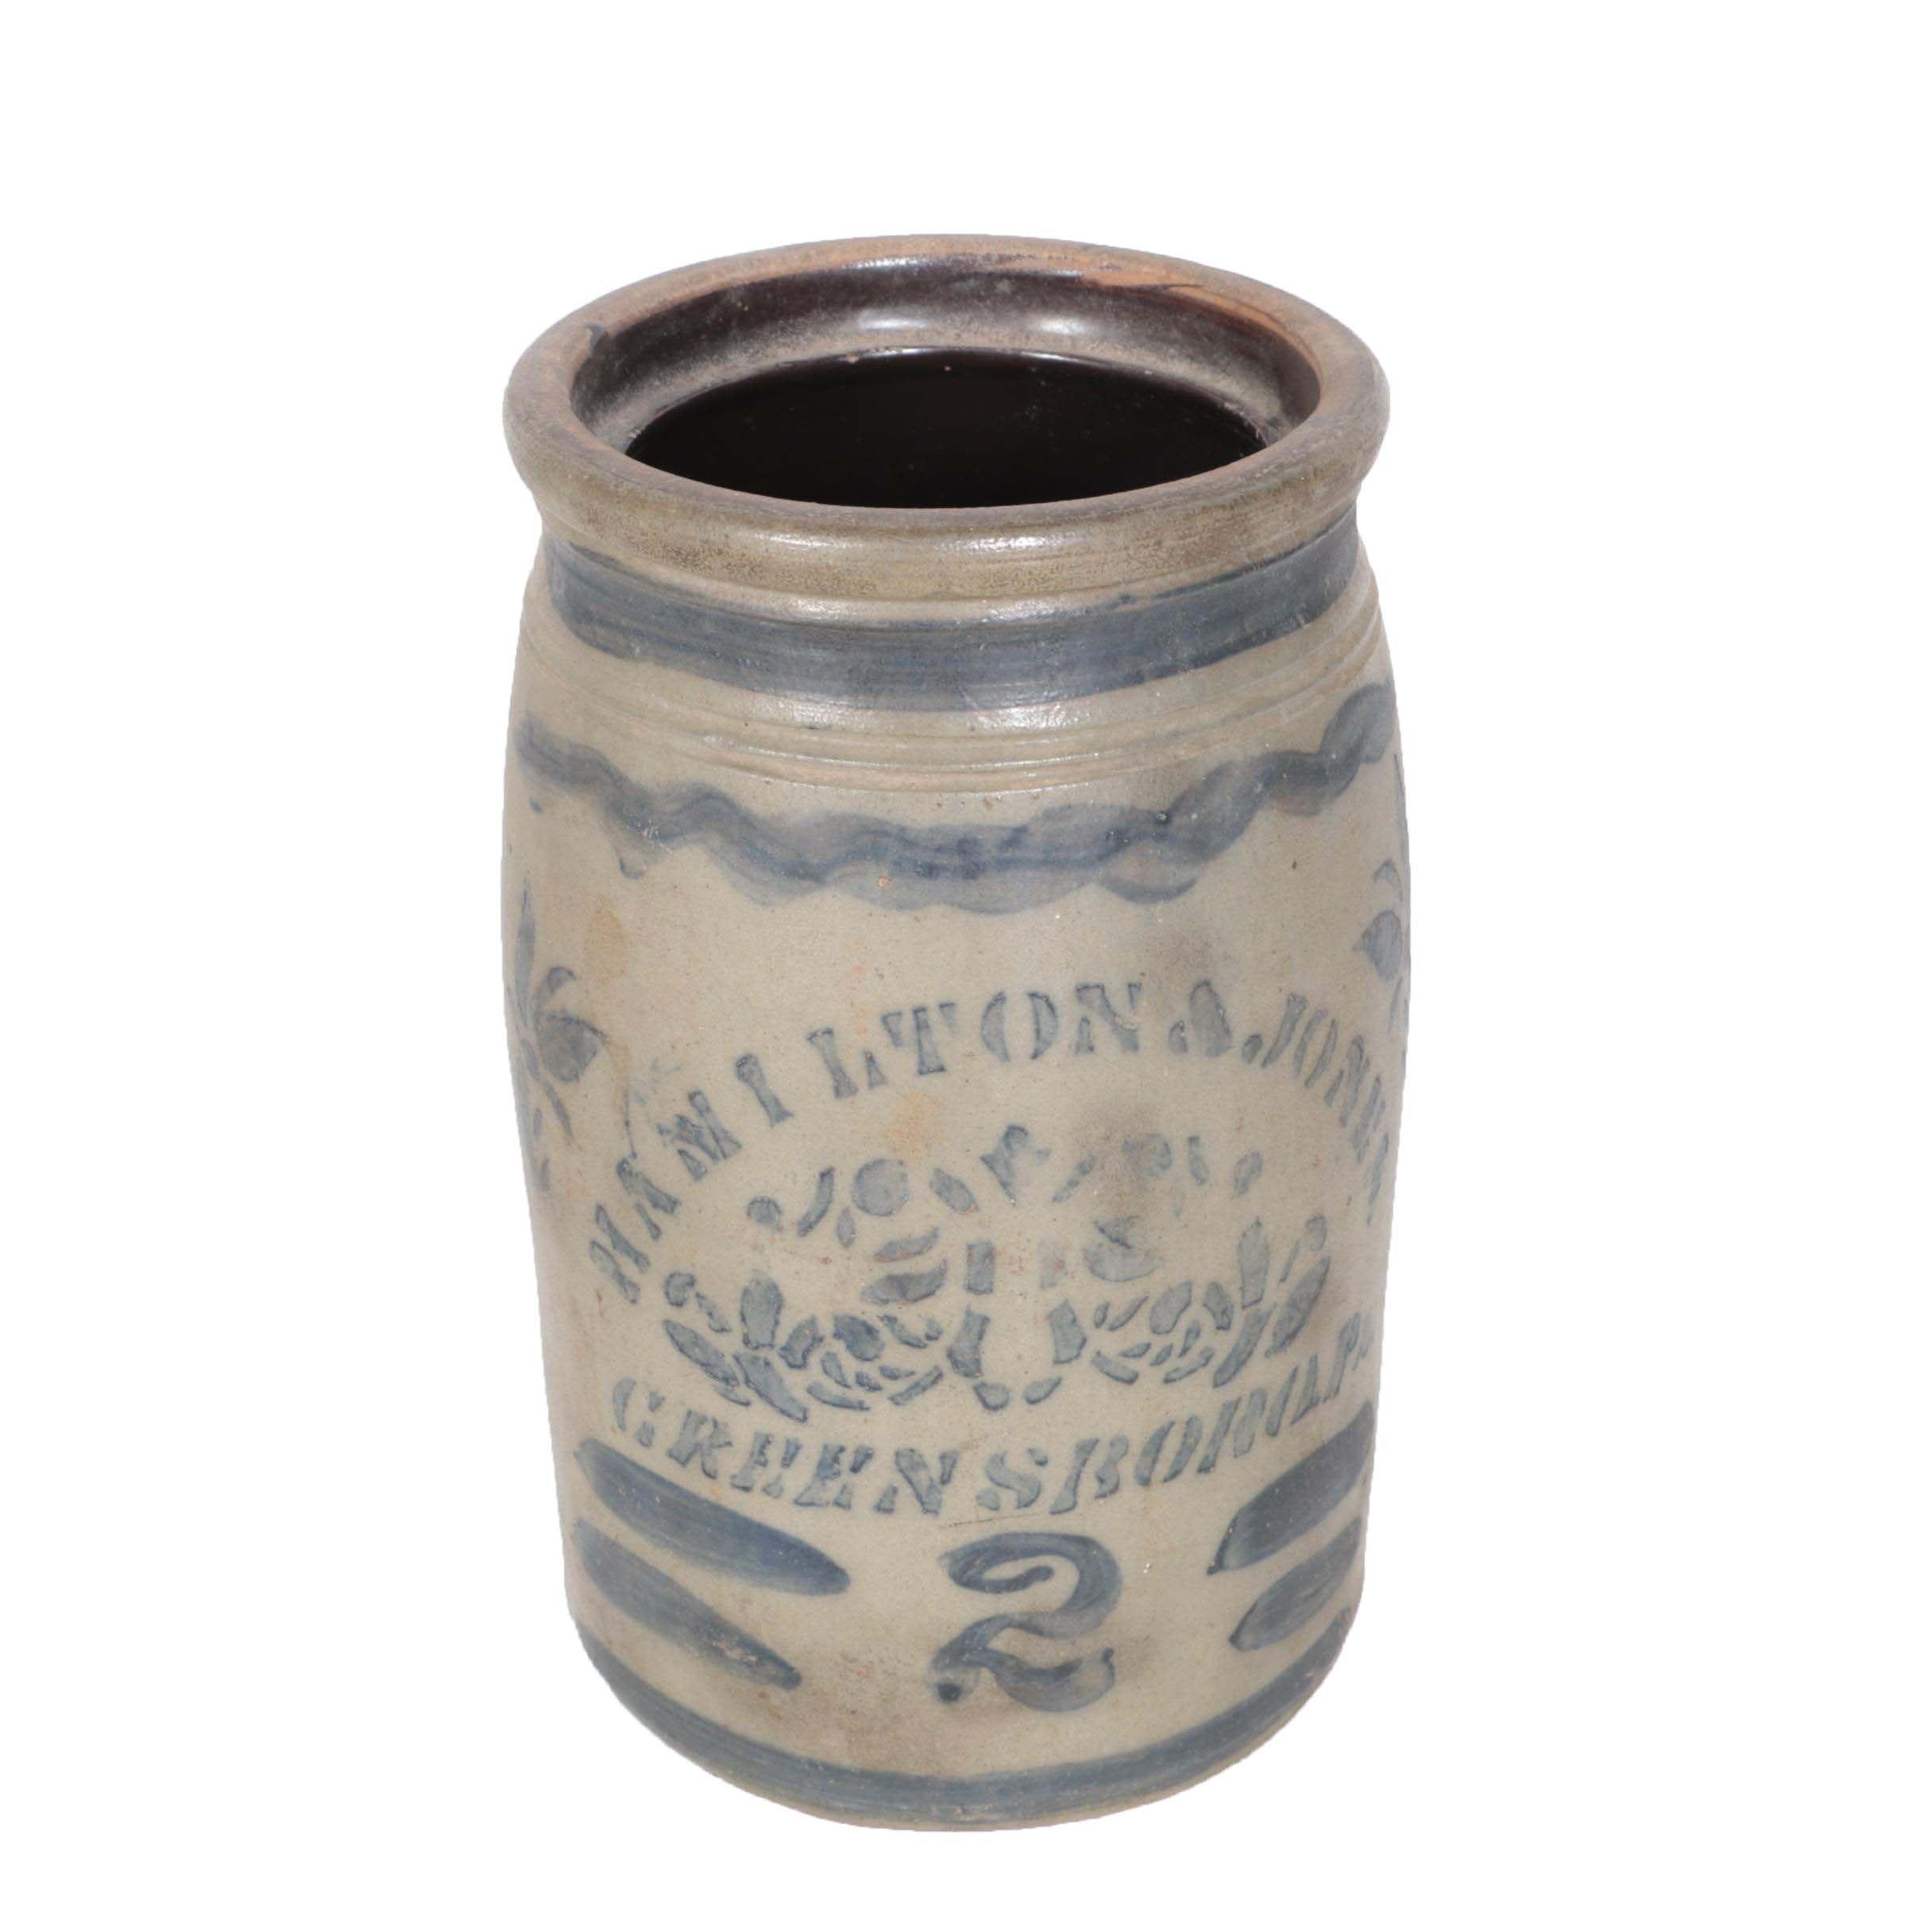 Hamilton & Jones 2-Gallon Stoneware Crock, Greensboro, Pennsylvania